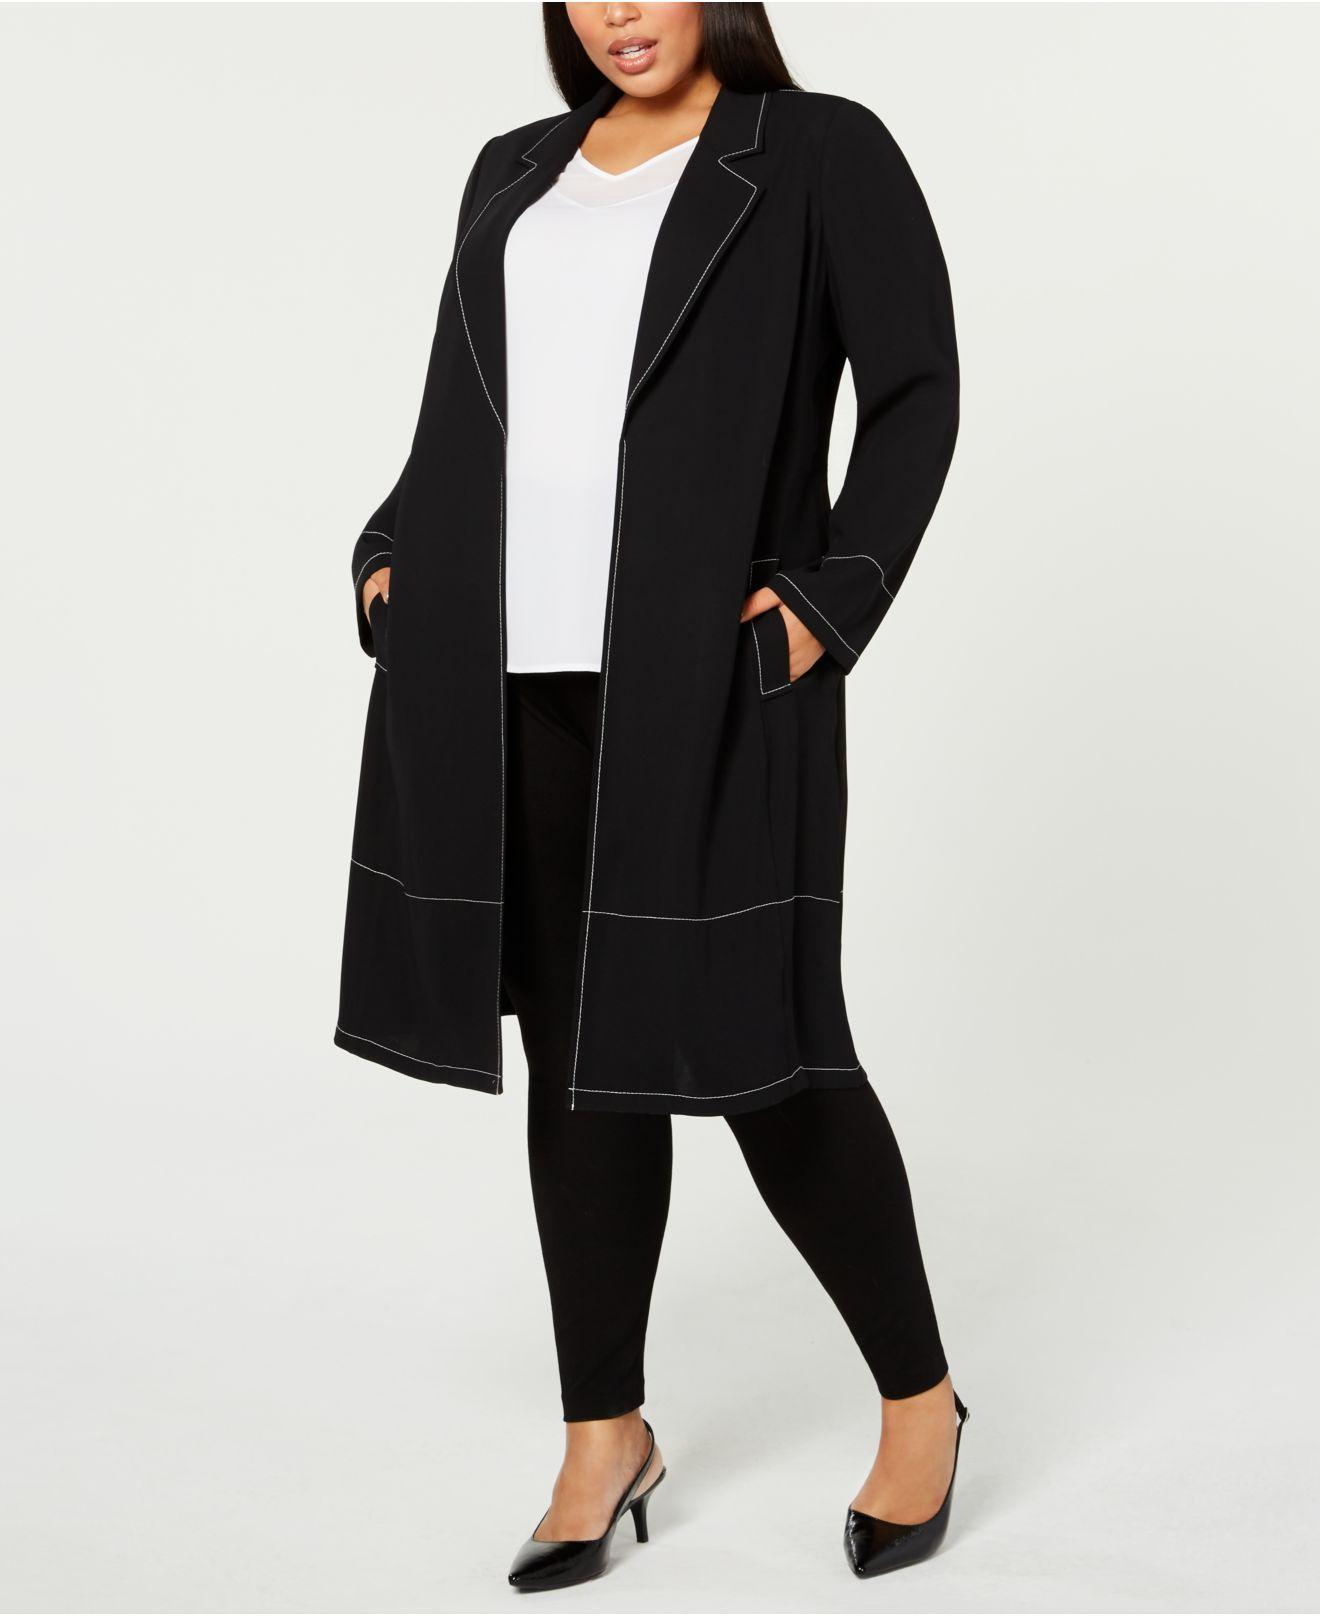 6cfa3f19a65 Alfani. Women s Black Plus Size Contrast-stitch Jacket